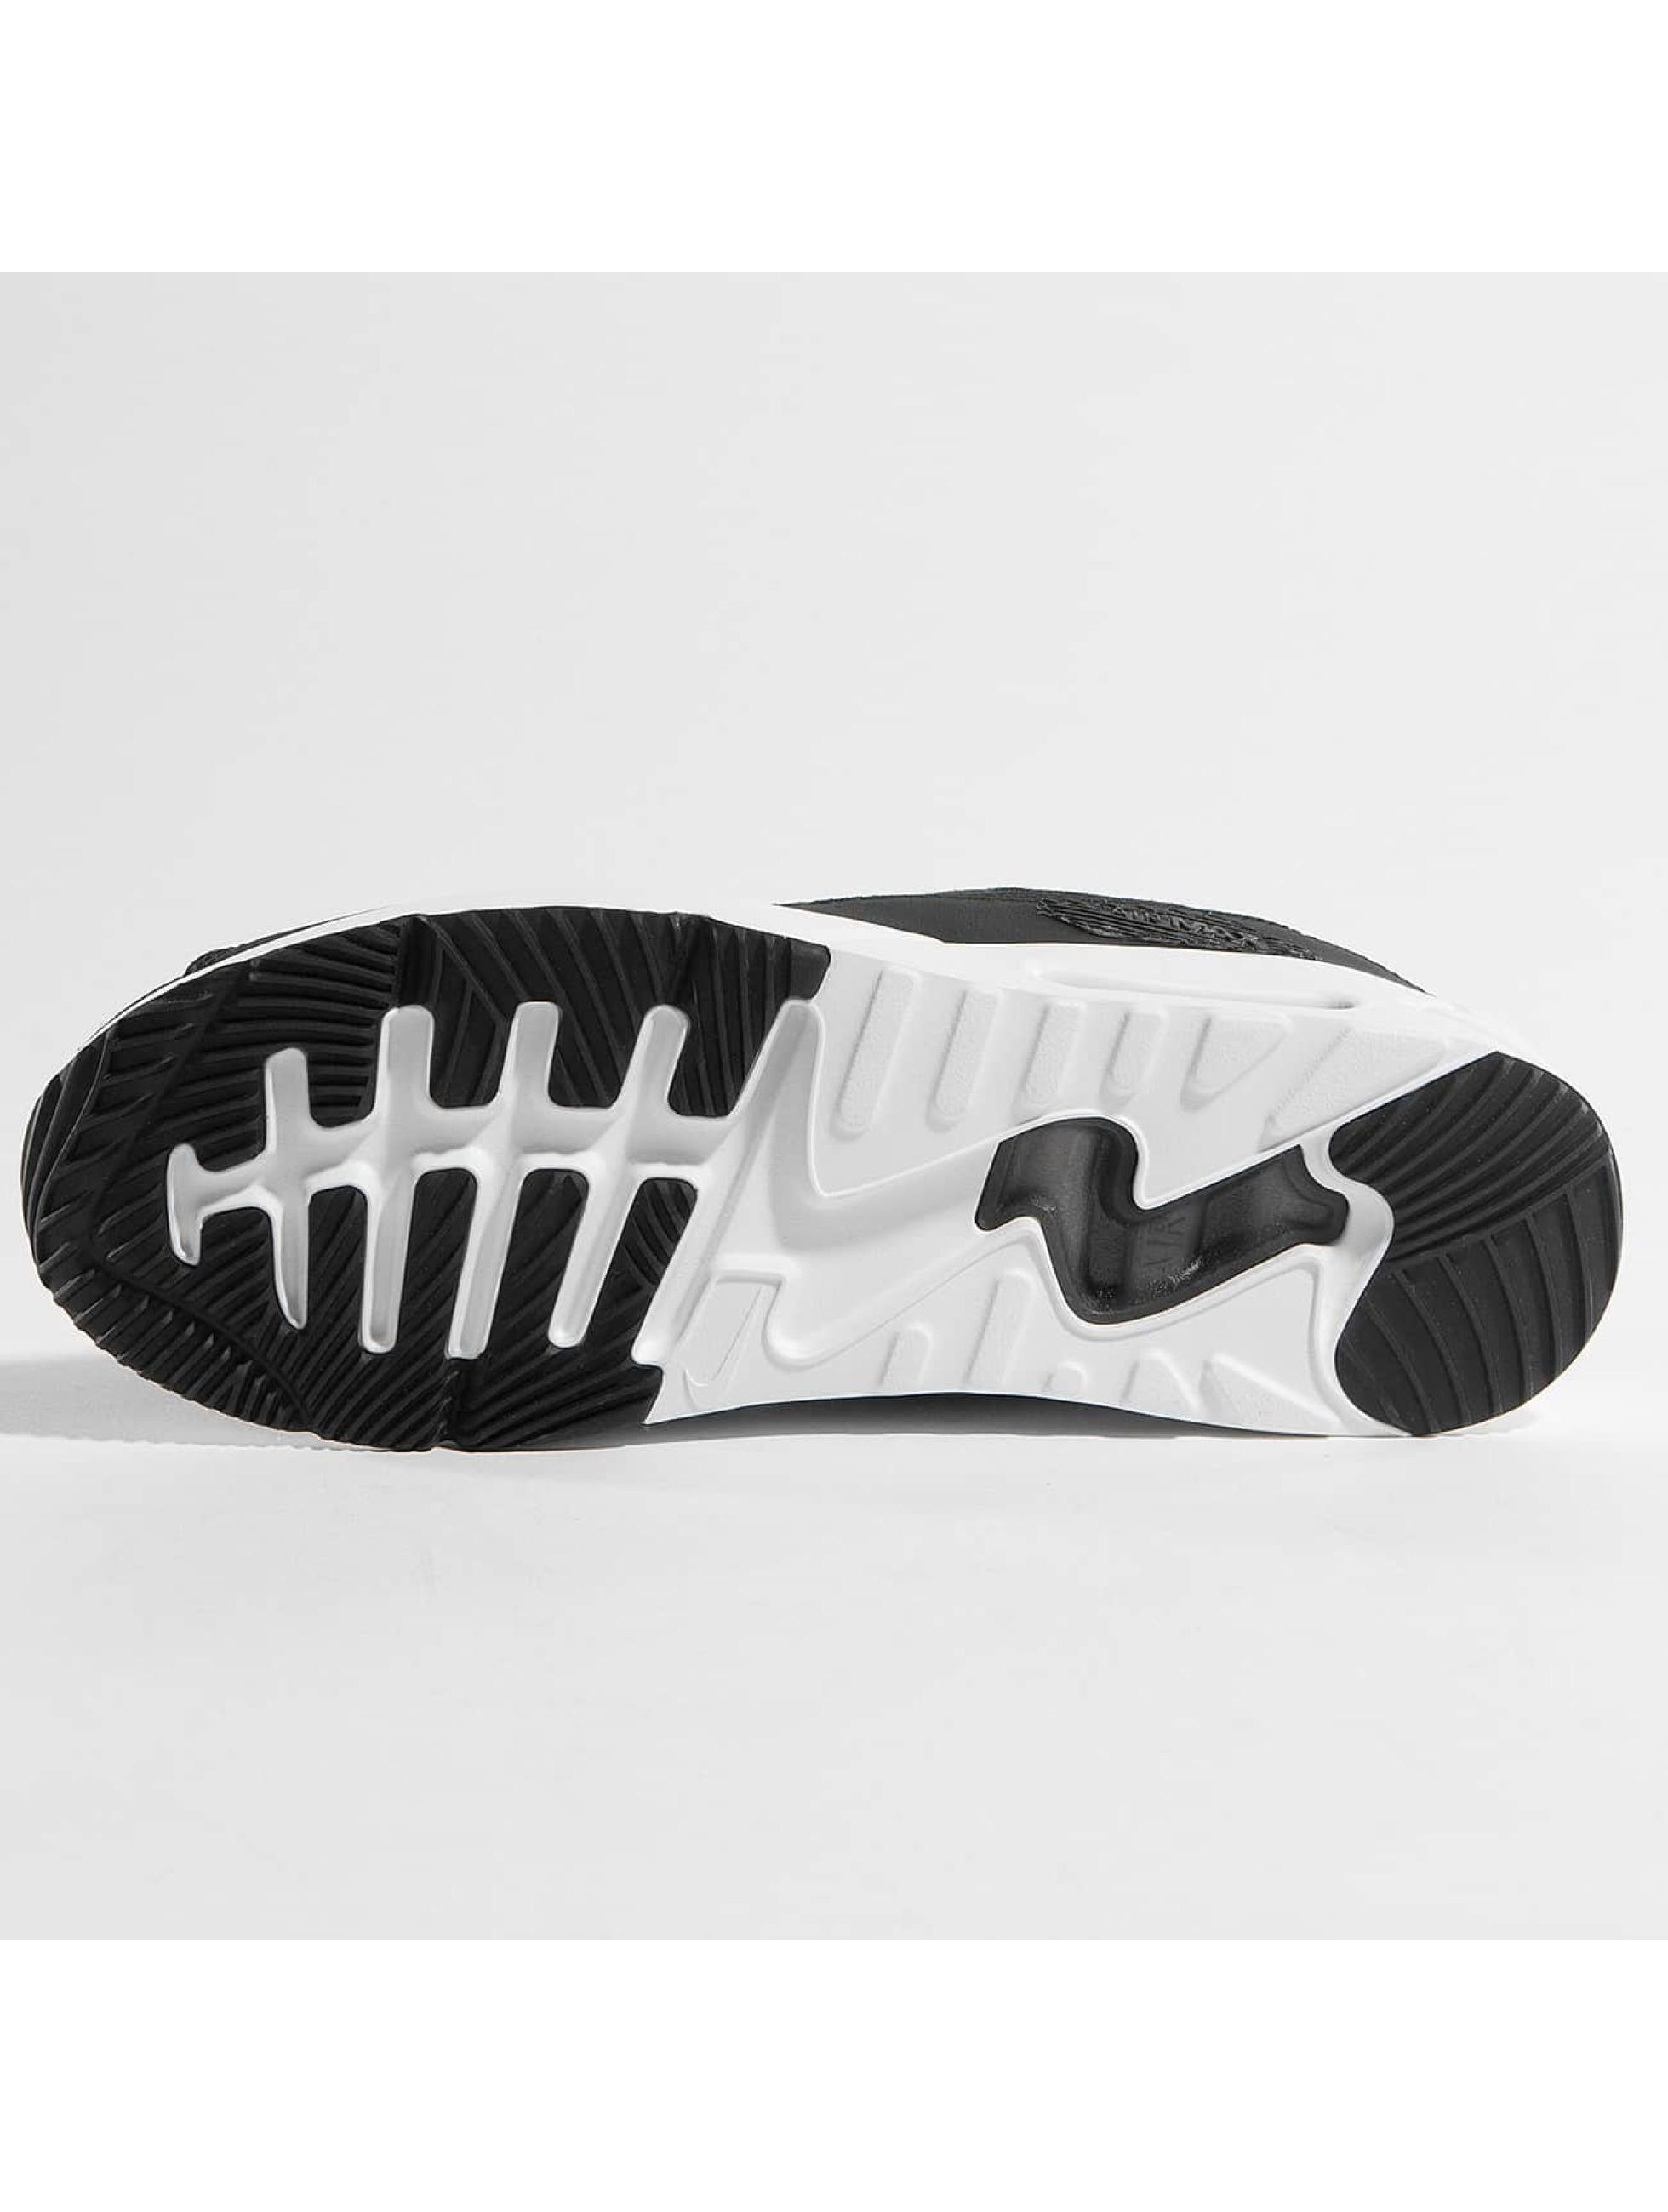 Nike Zapatillas de deporte Air Max 90 Ultra 2.0 LTR negro